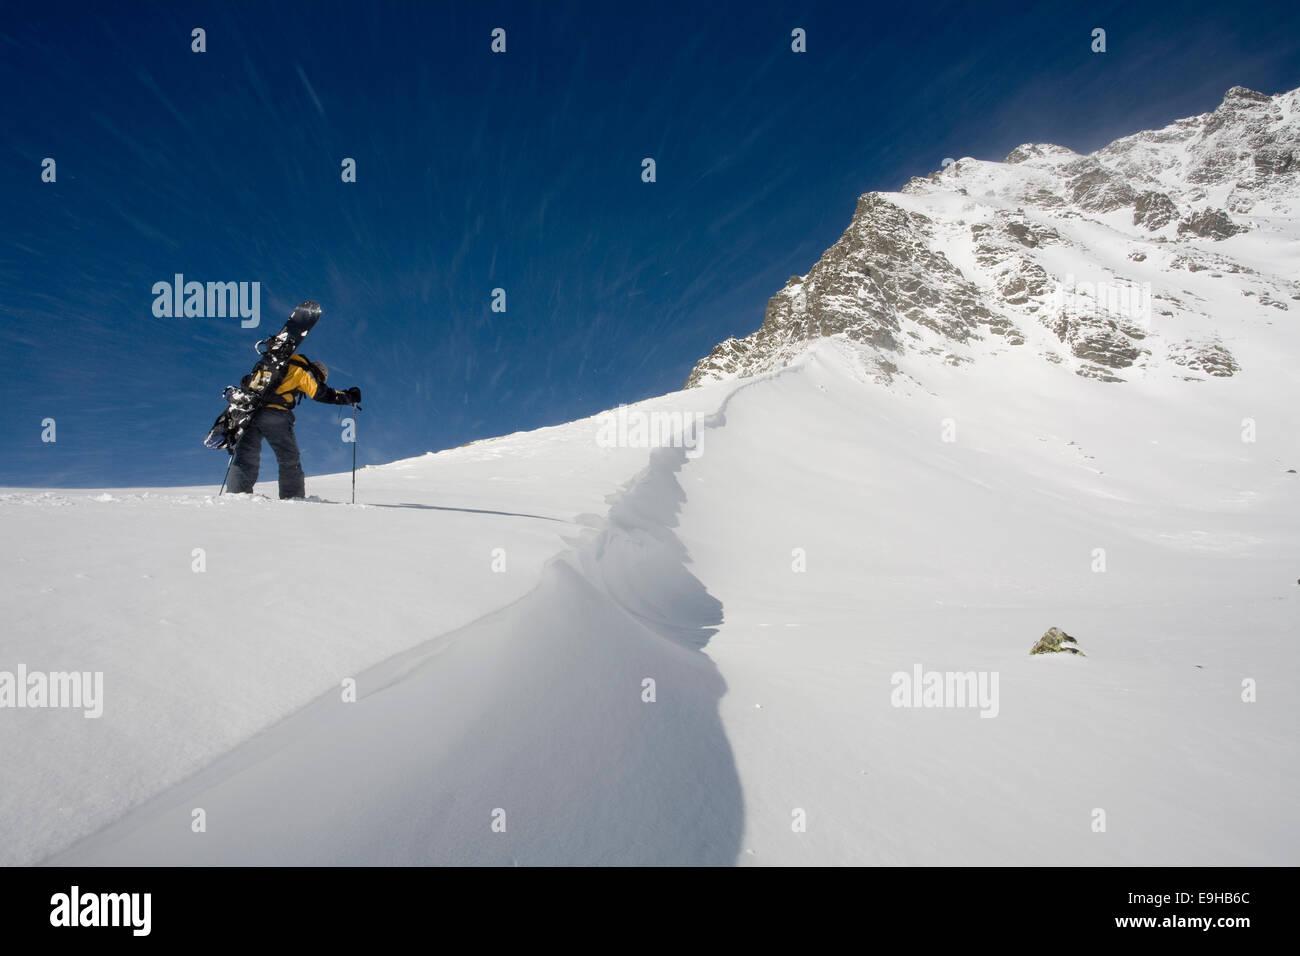 Snowboarder, freerider, during the ascent, near Kühtai, Tyrol, Austria - Stock Image